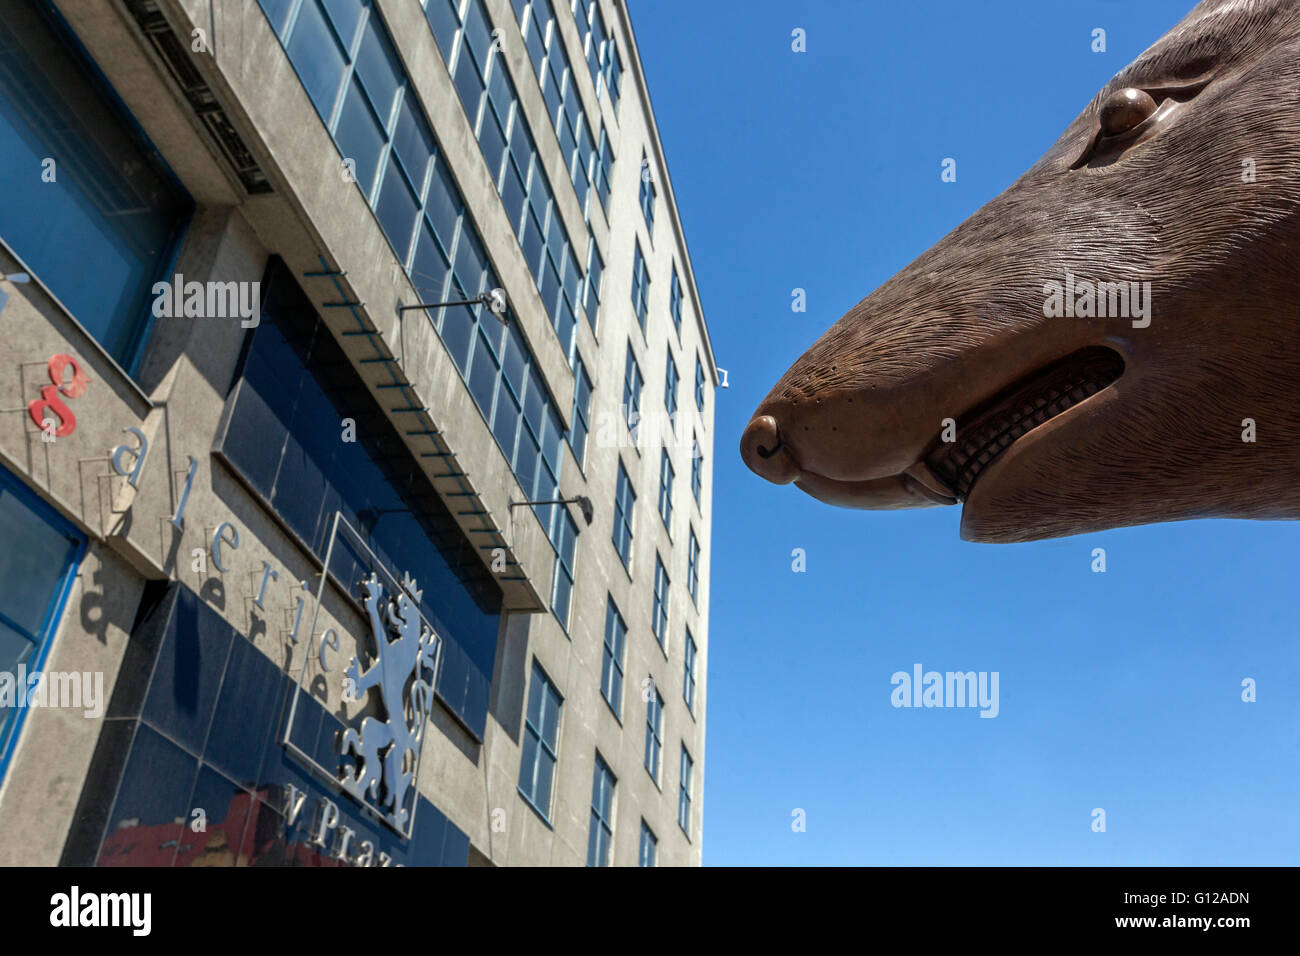 Ai Weiwei art work - Zodiac Heads front of The National Gallery, Holesovice, Prague, Czech Republic, rat - Stock Image